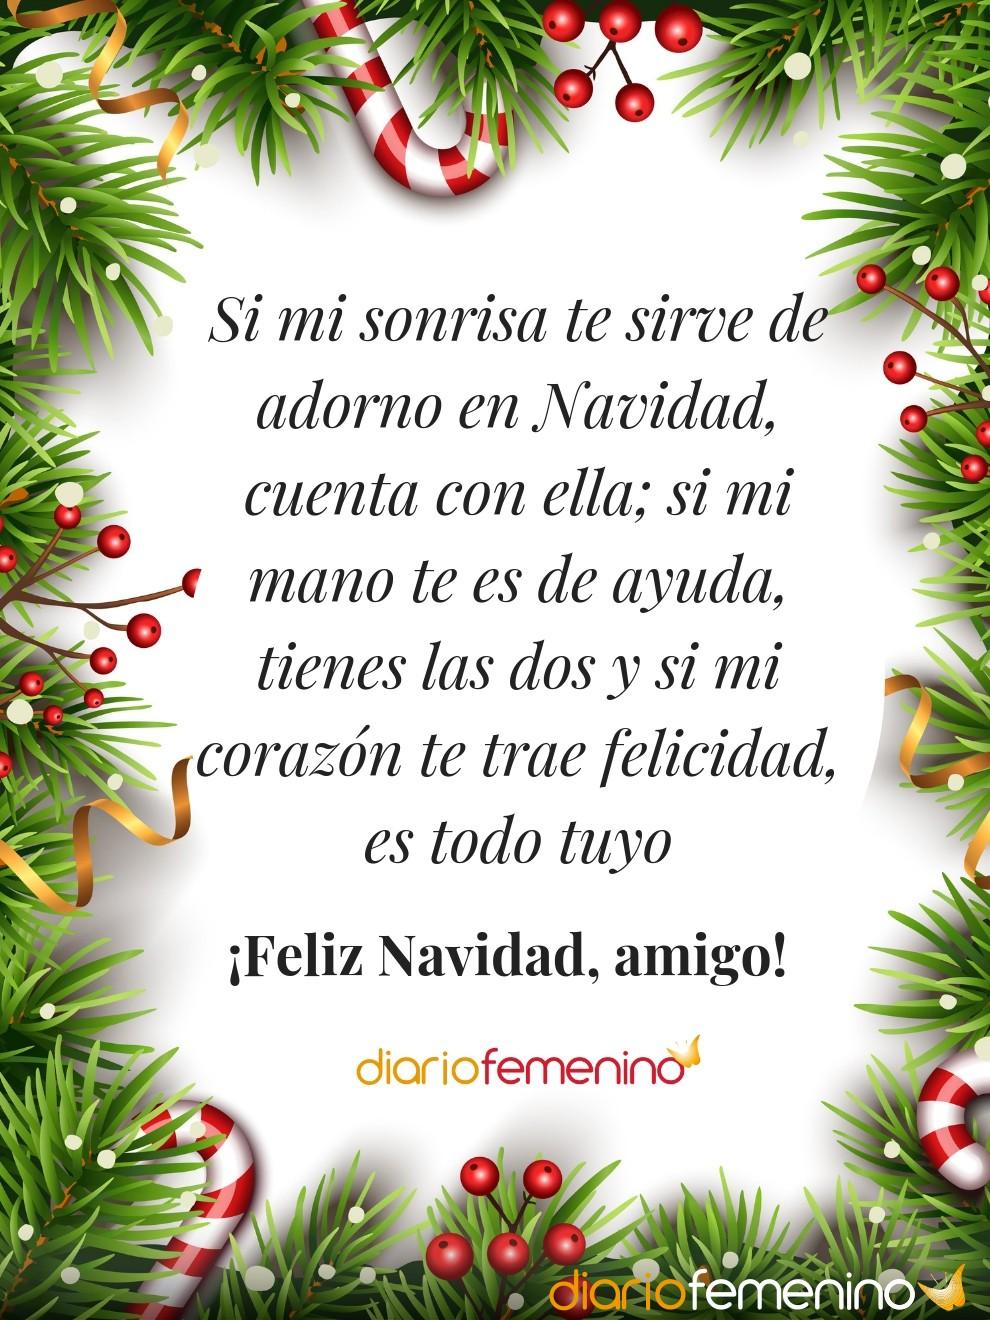 Tarjeta navideña con mensaje para enviar a tus amigos